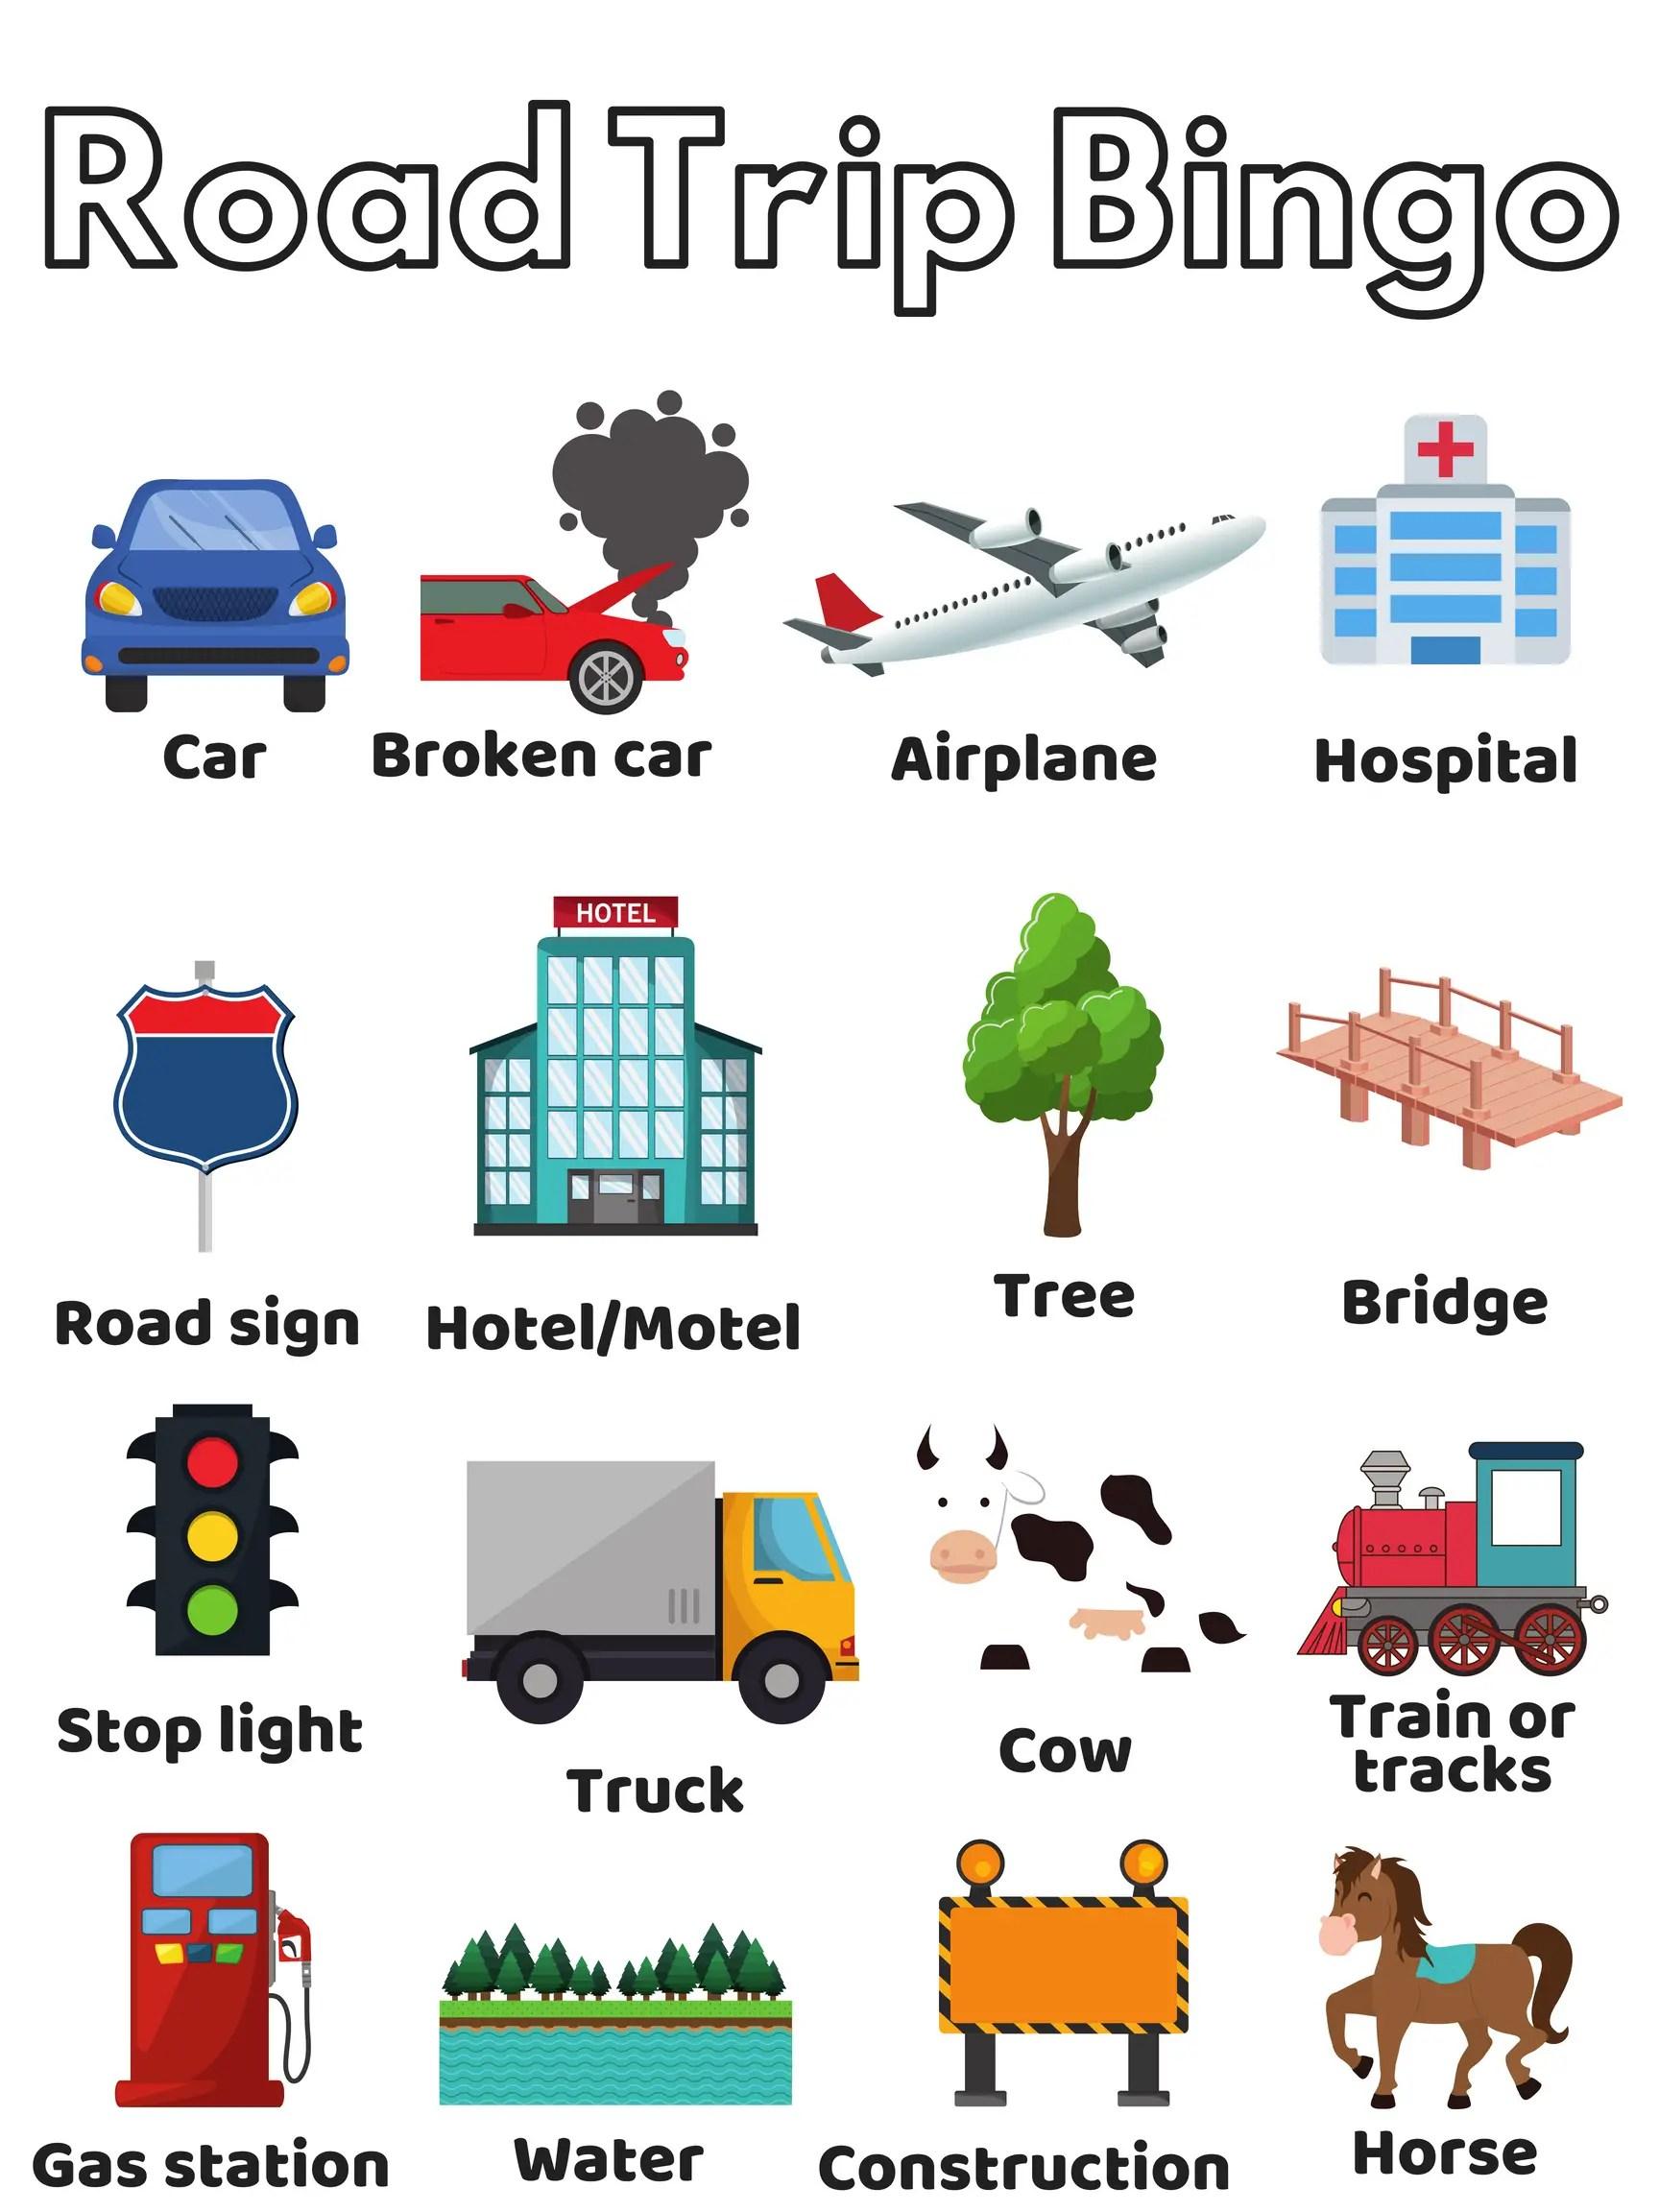 28 Amusing Road Trip Bingo Templates